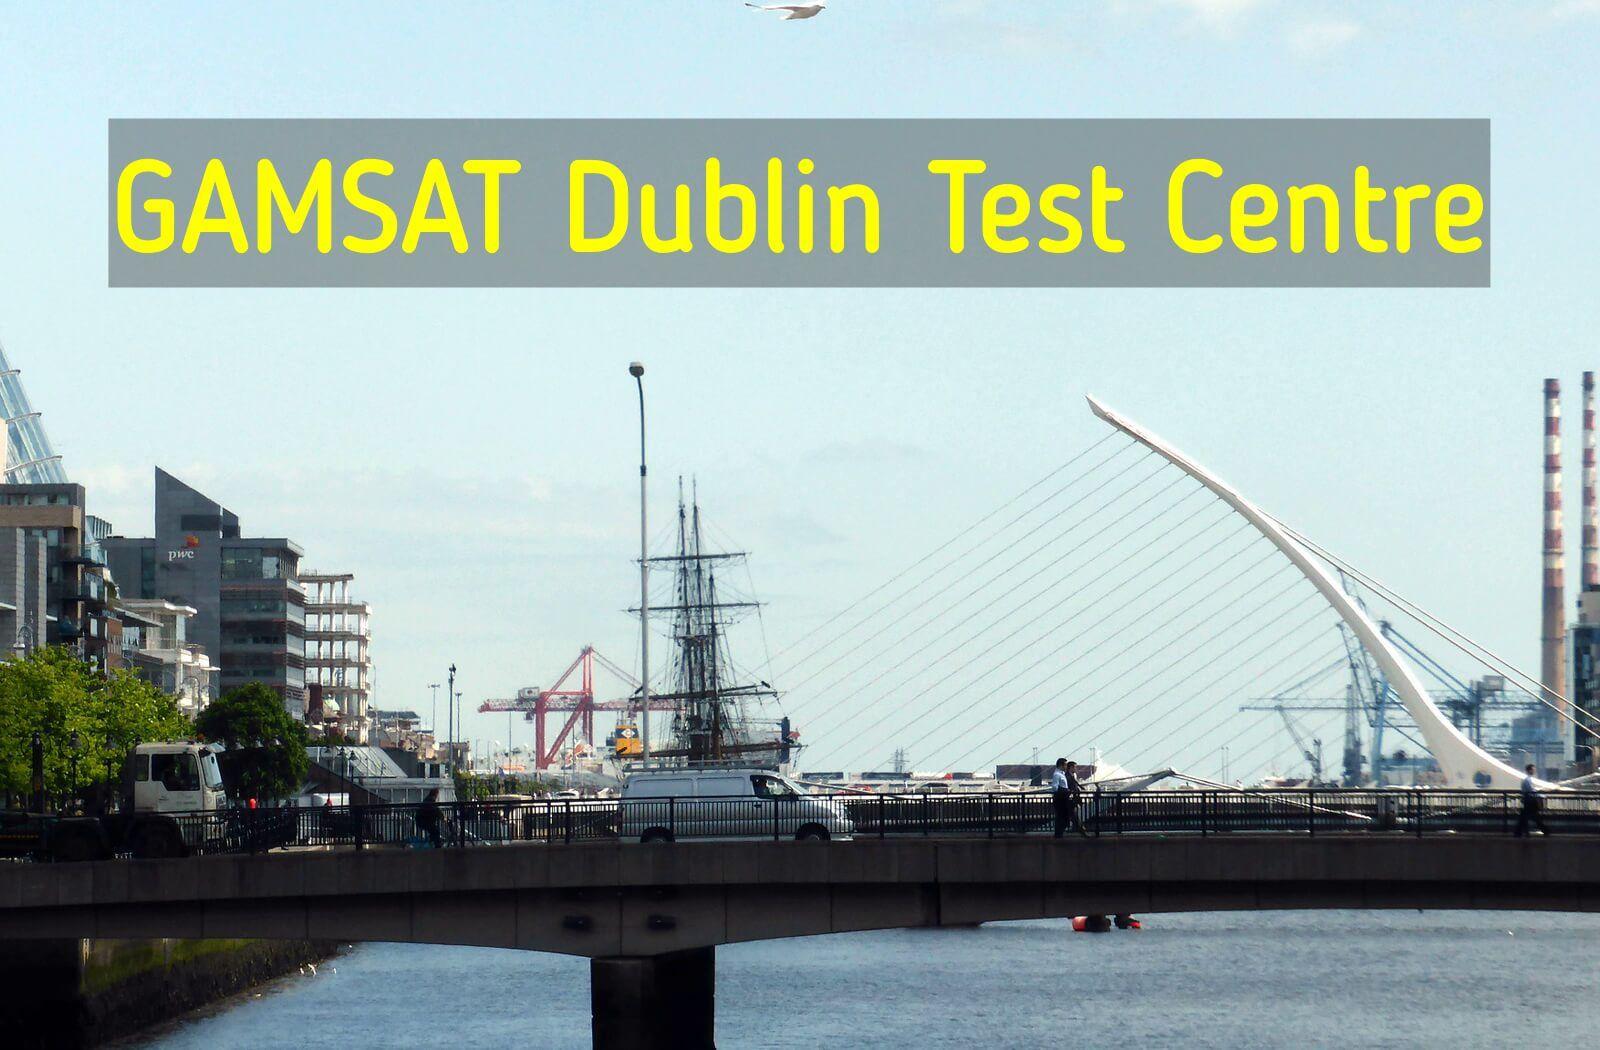 Where is GAMSAT held in Dublin?